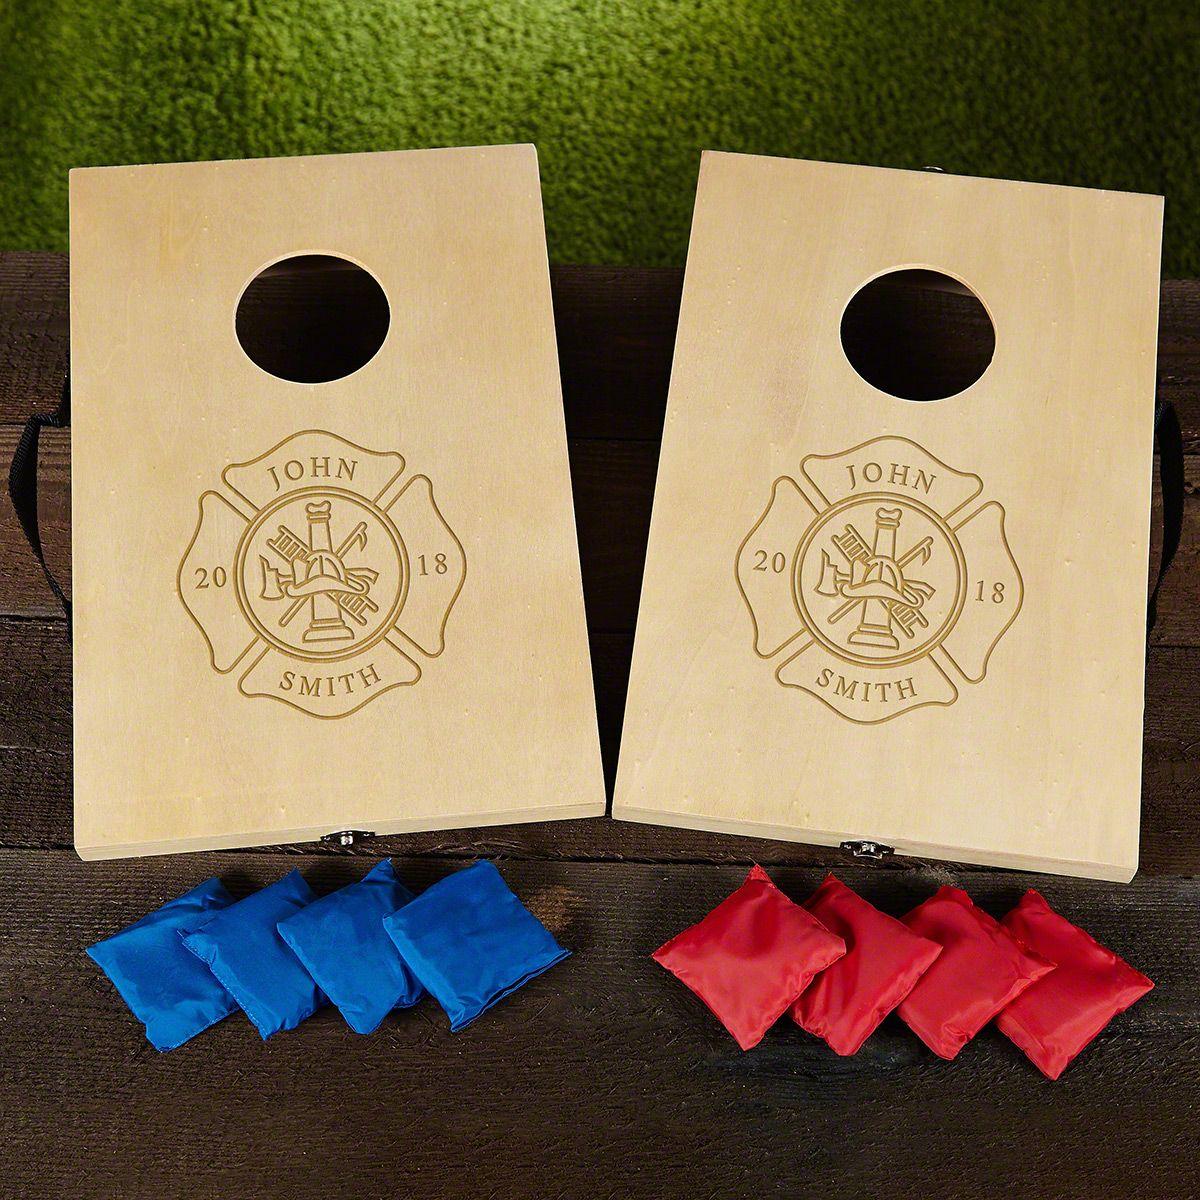 Personalized Firefighter Cornhole Game Set